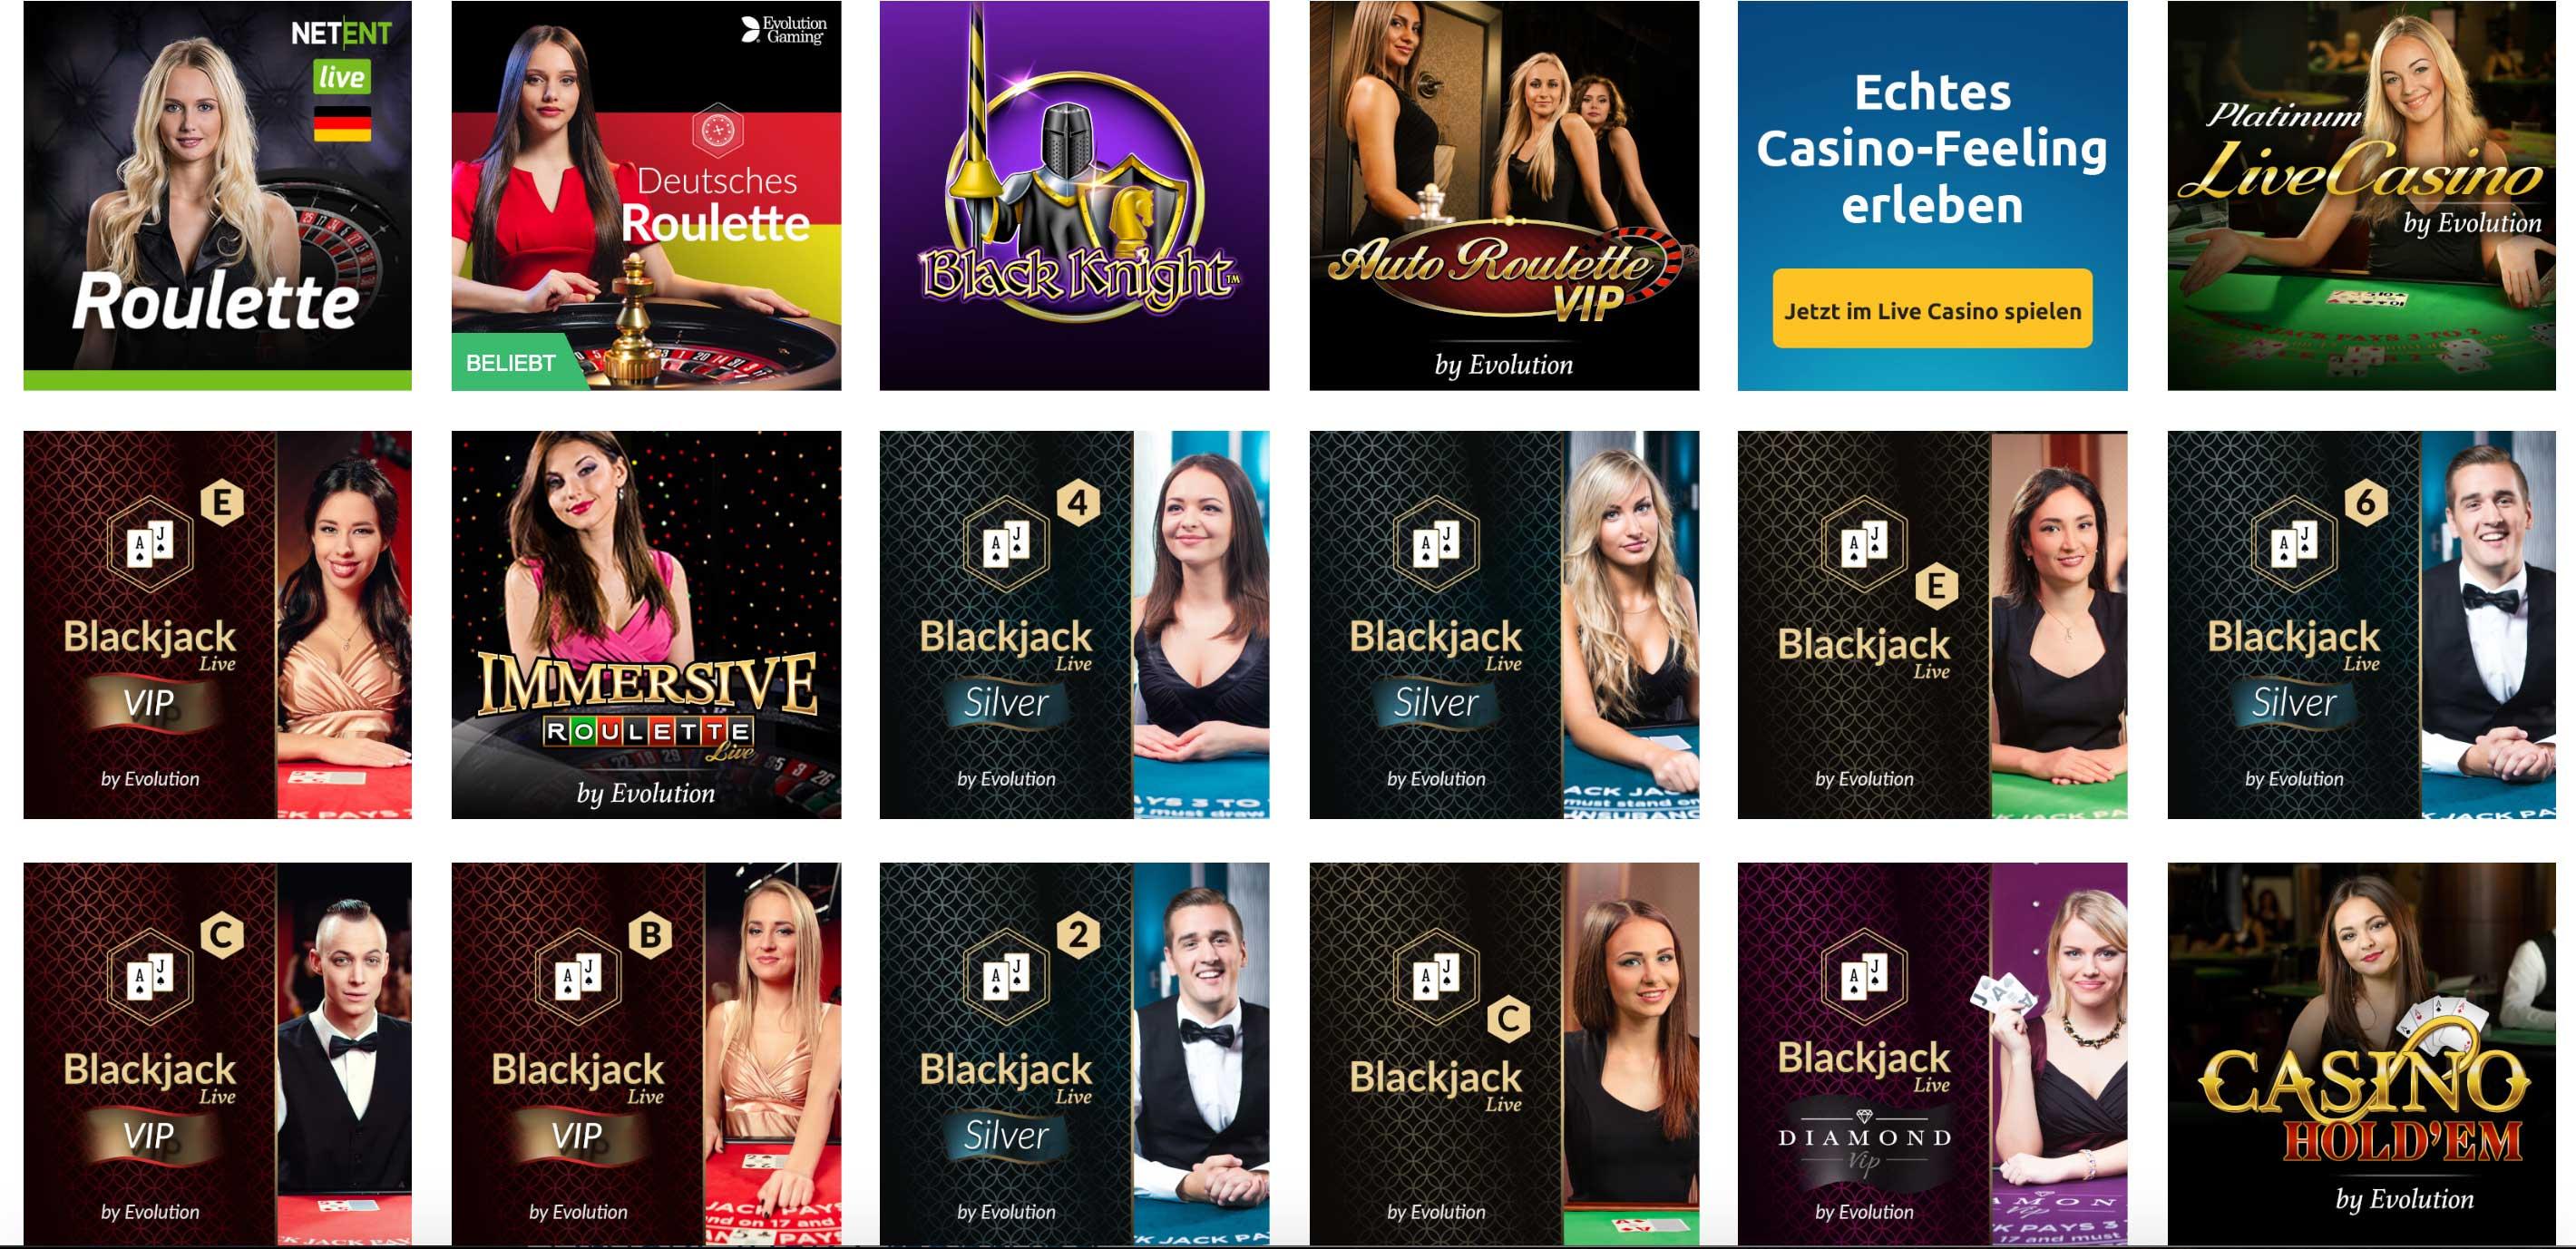 DrückGlück Live Dealer Spiele im Live Casino